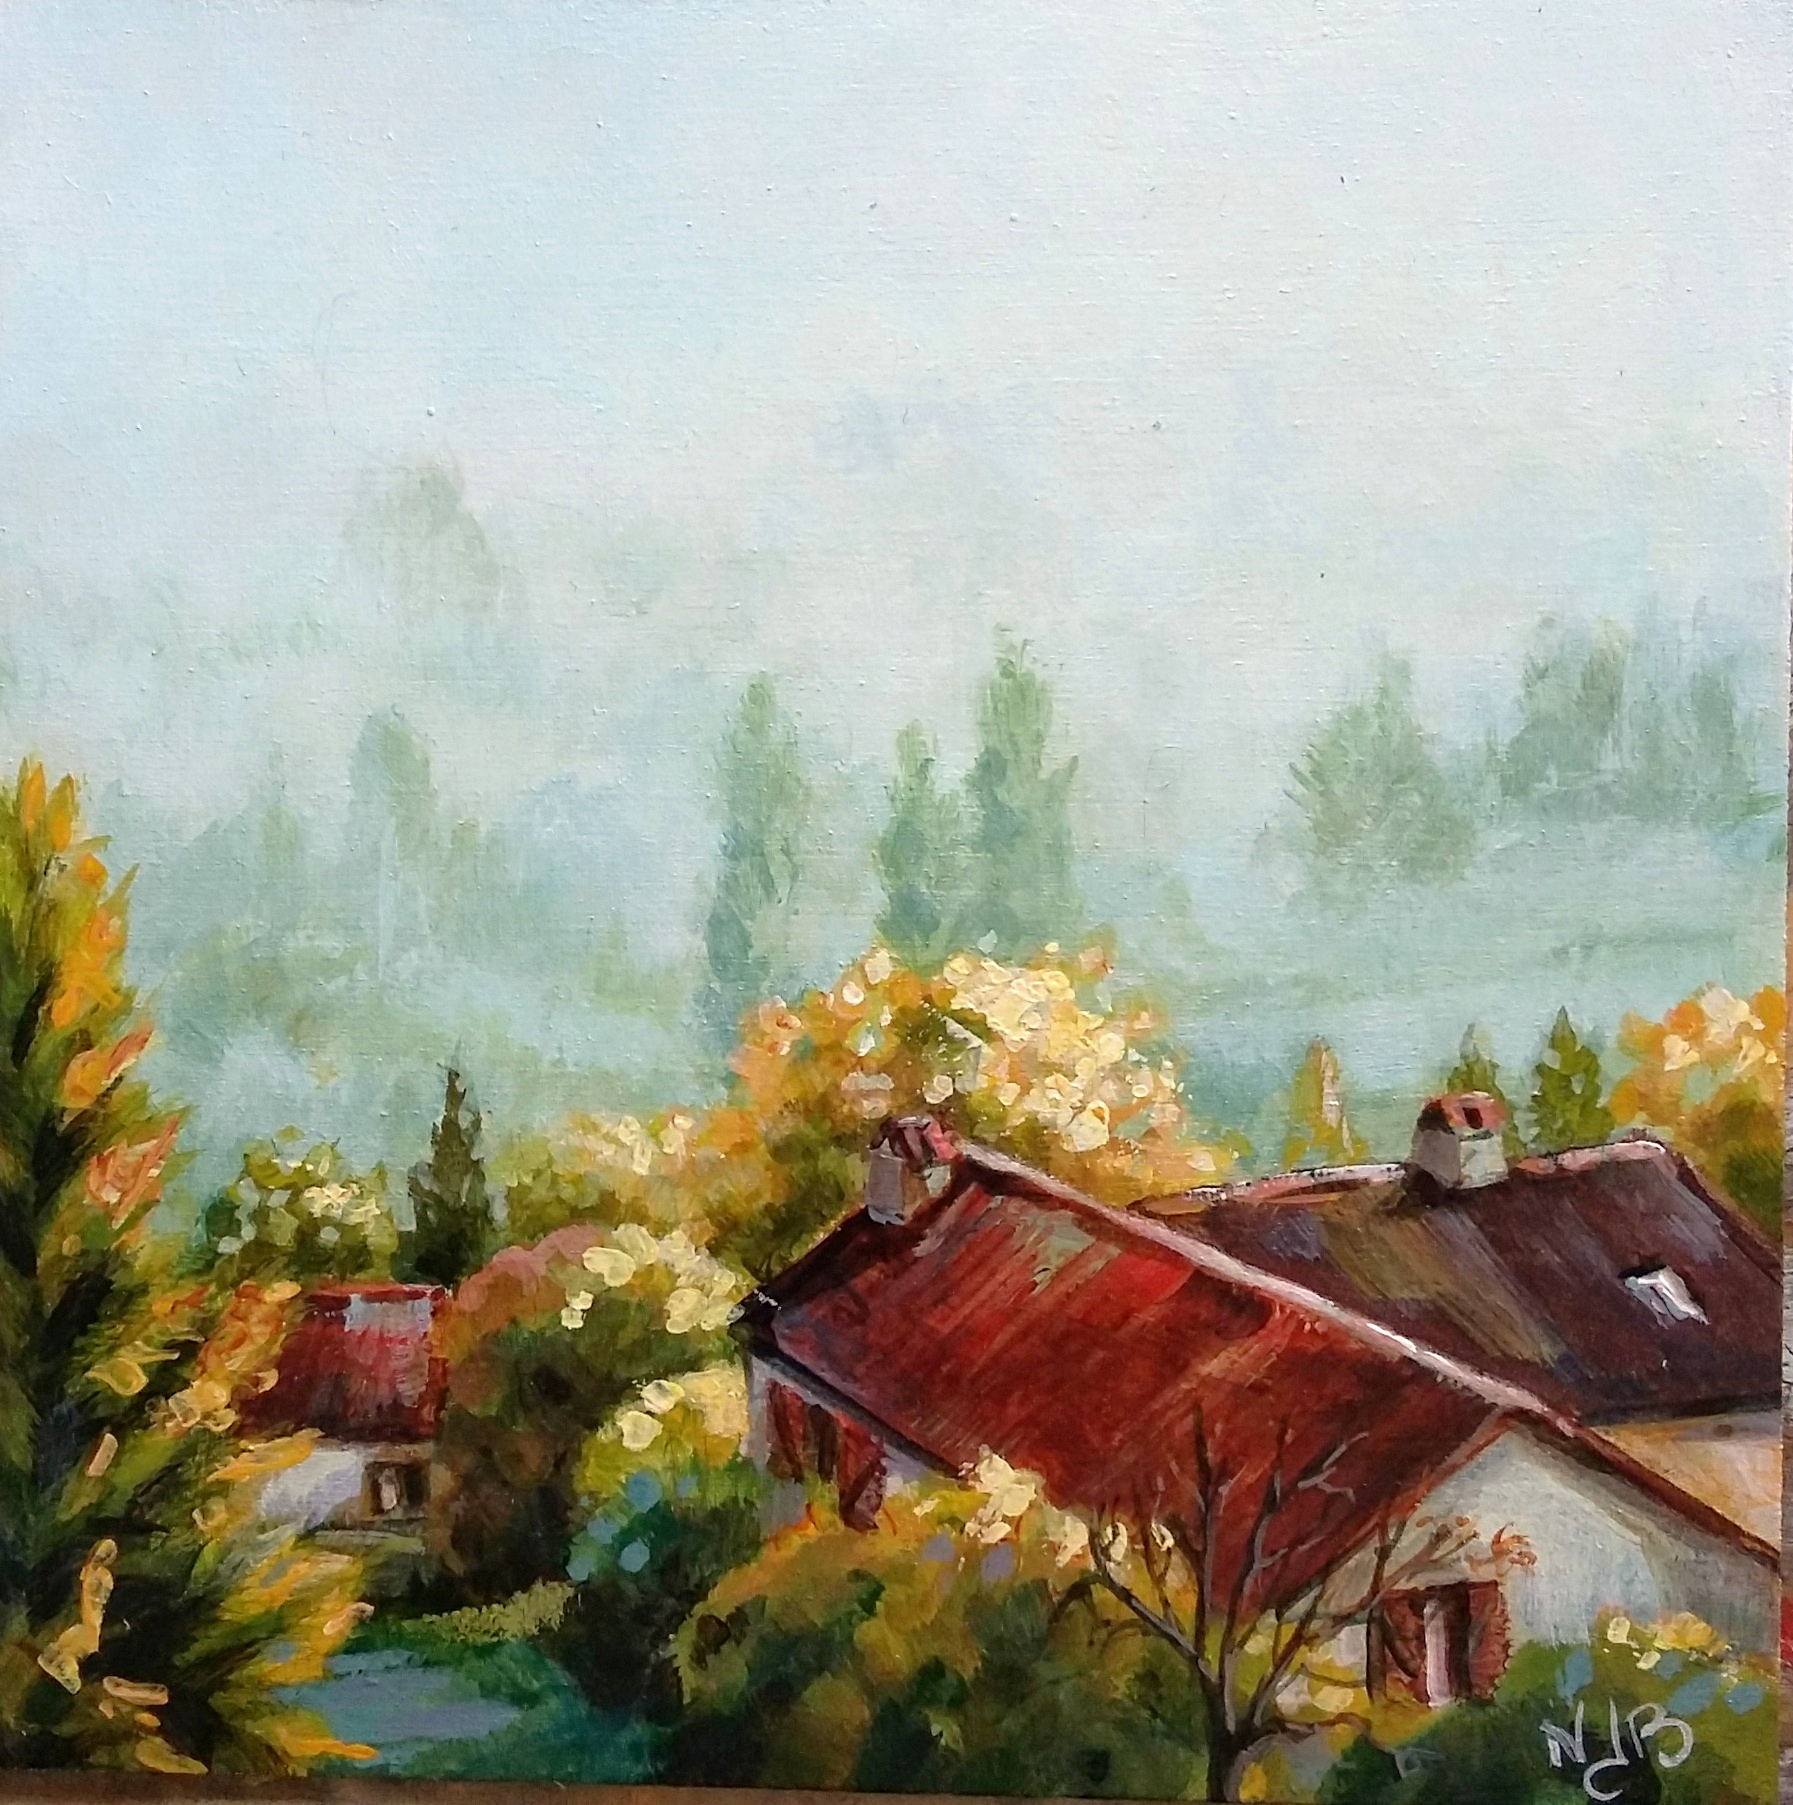 Misty morning, acrylic painting